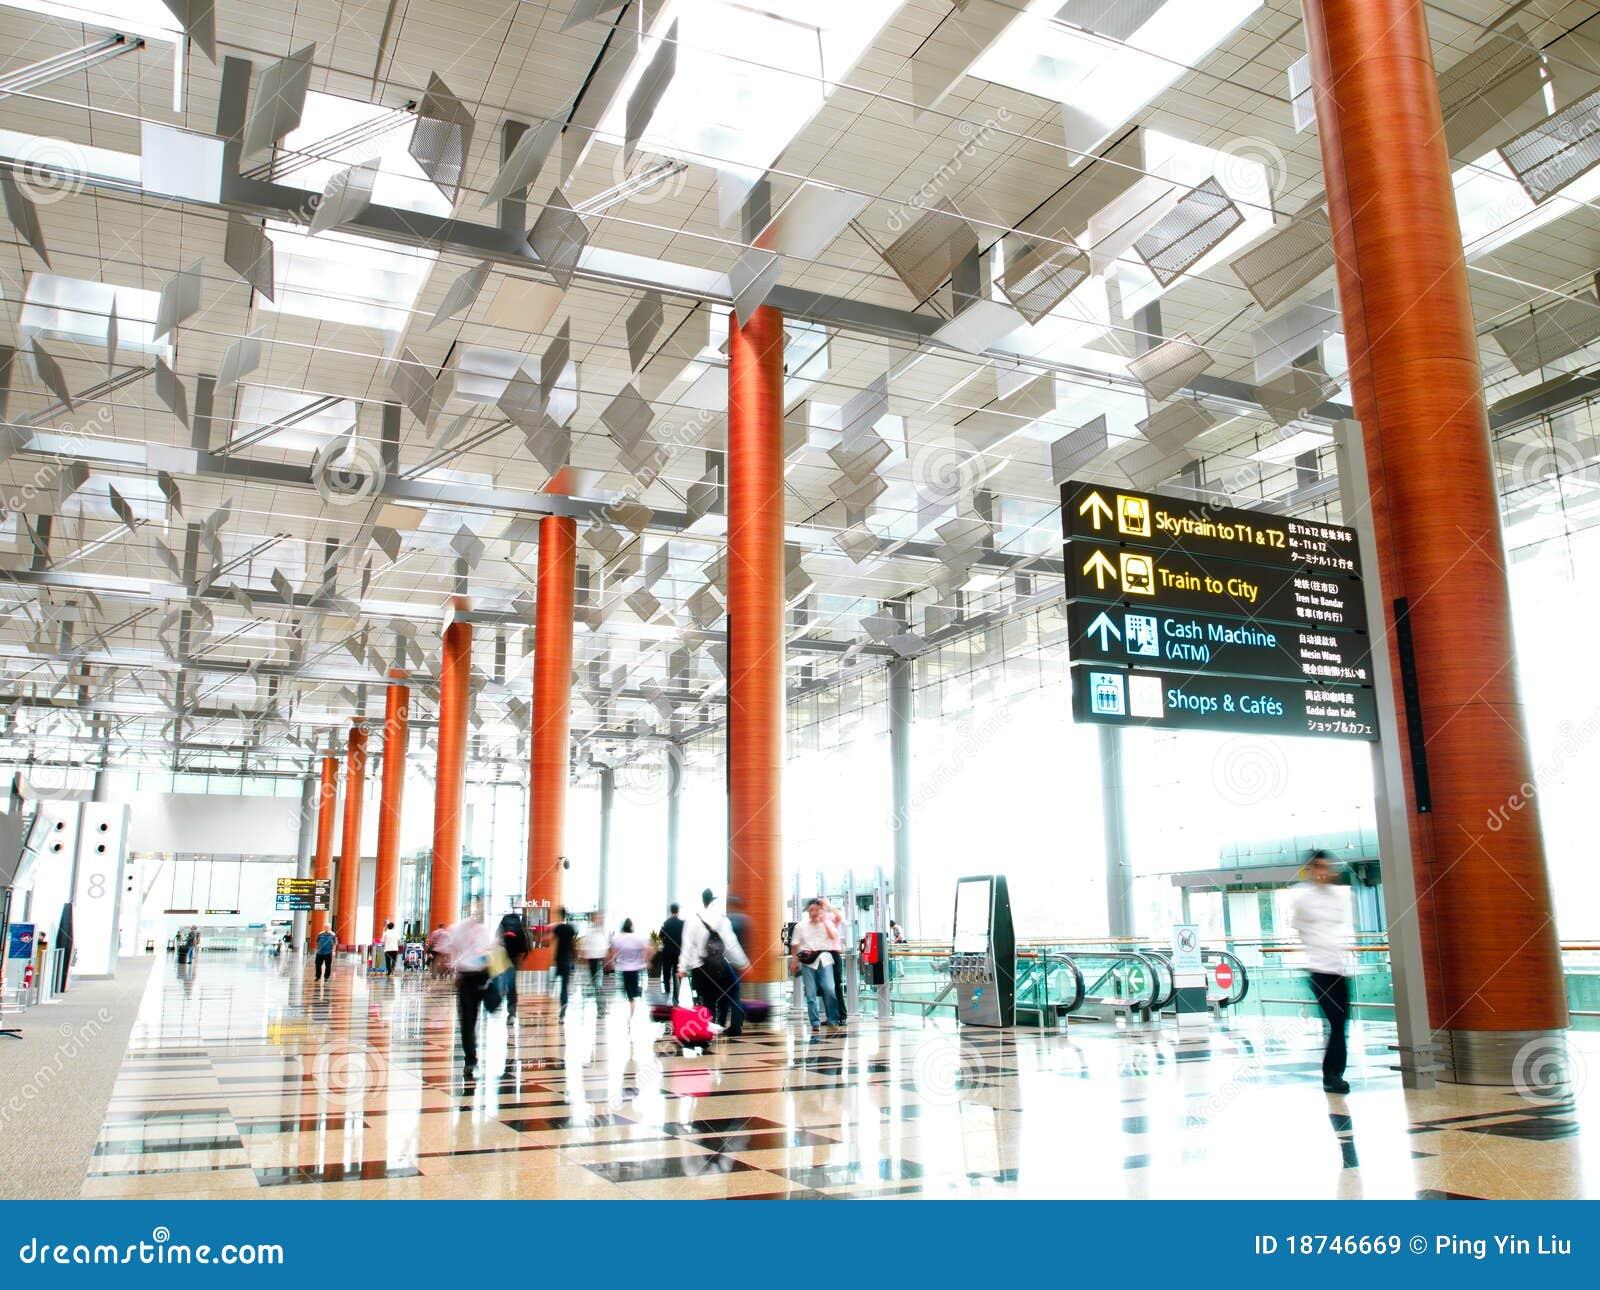 Crowne Plaza Hotel Changi Airport – Singapore Airport Hotel